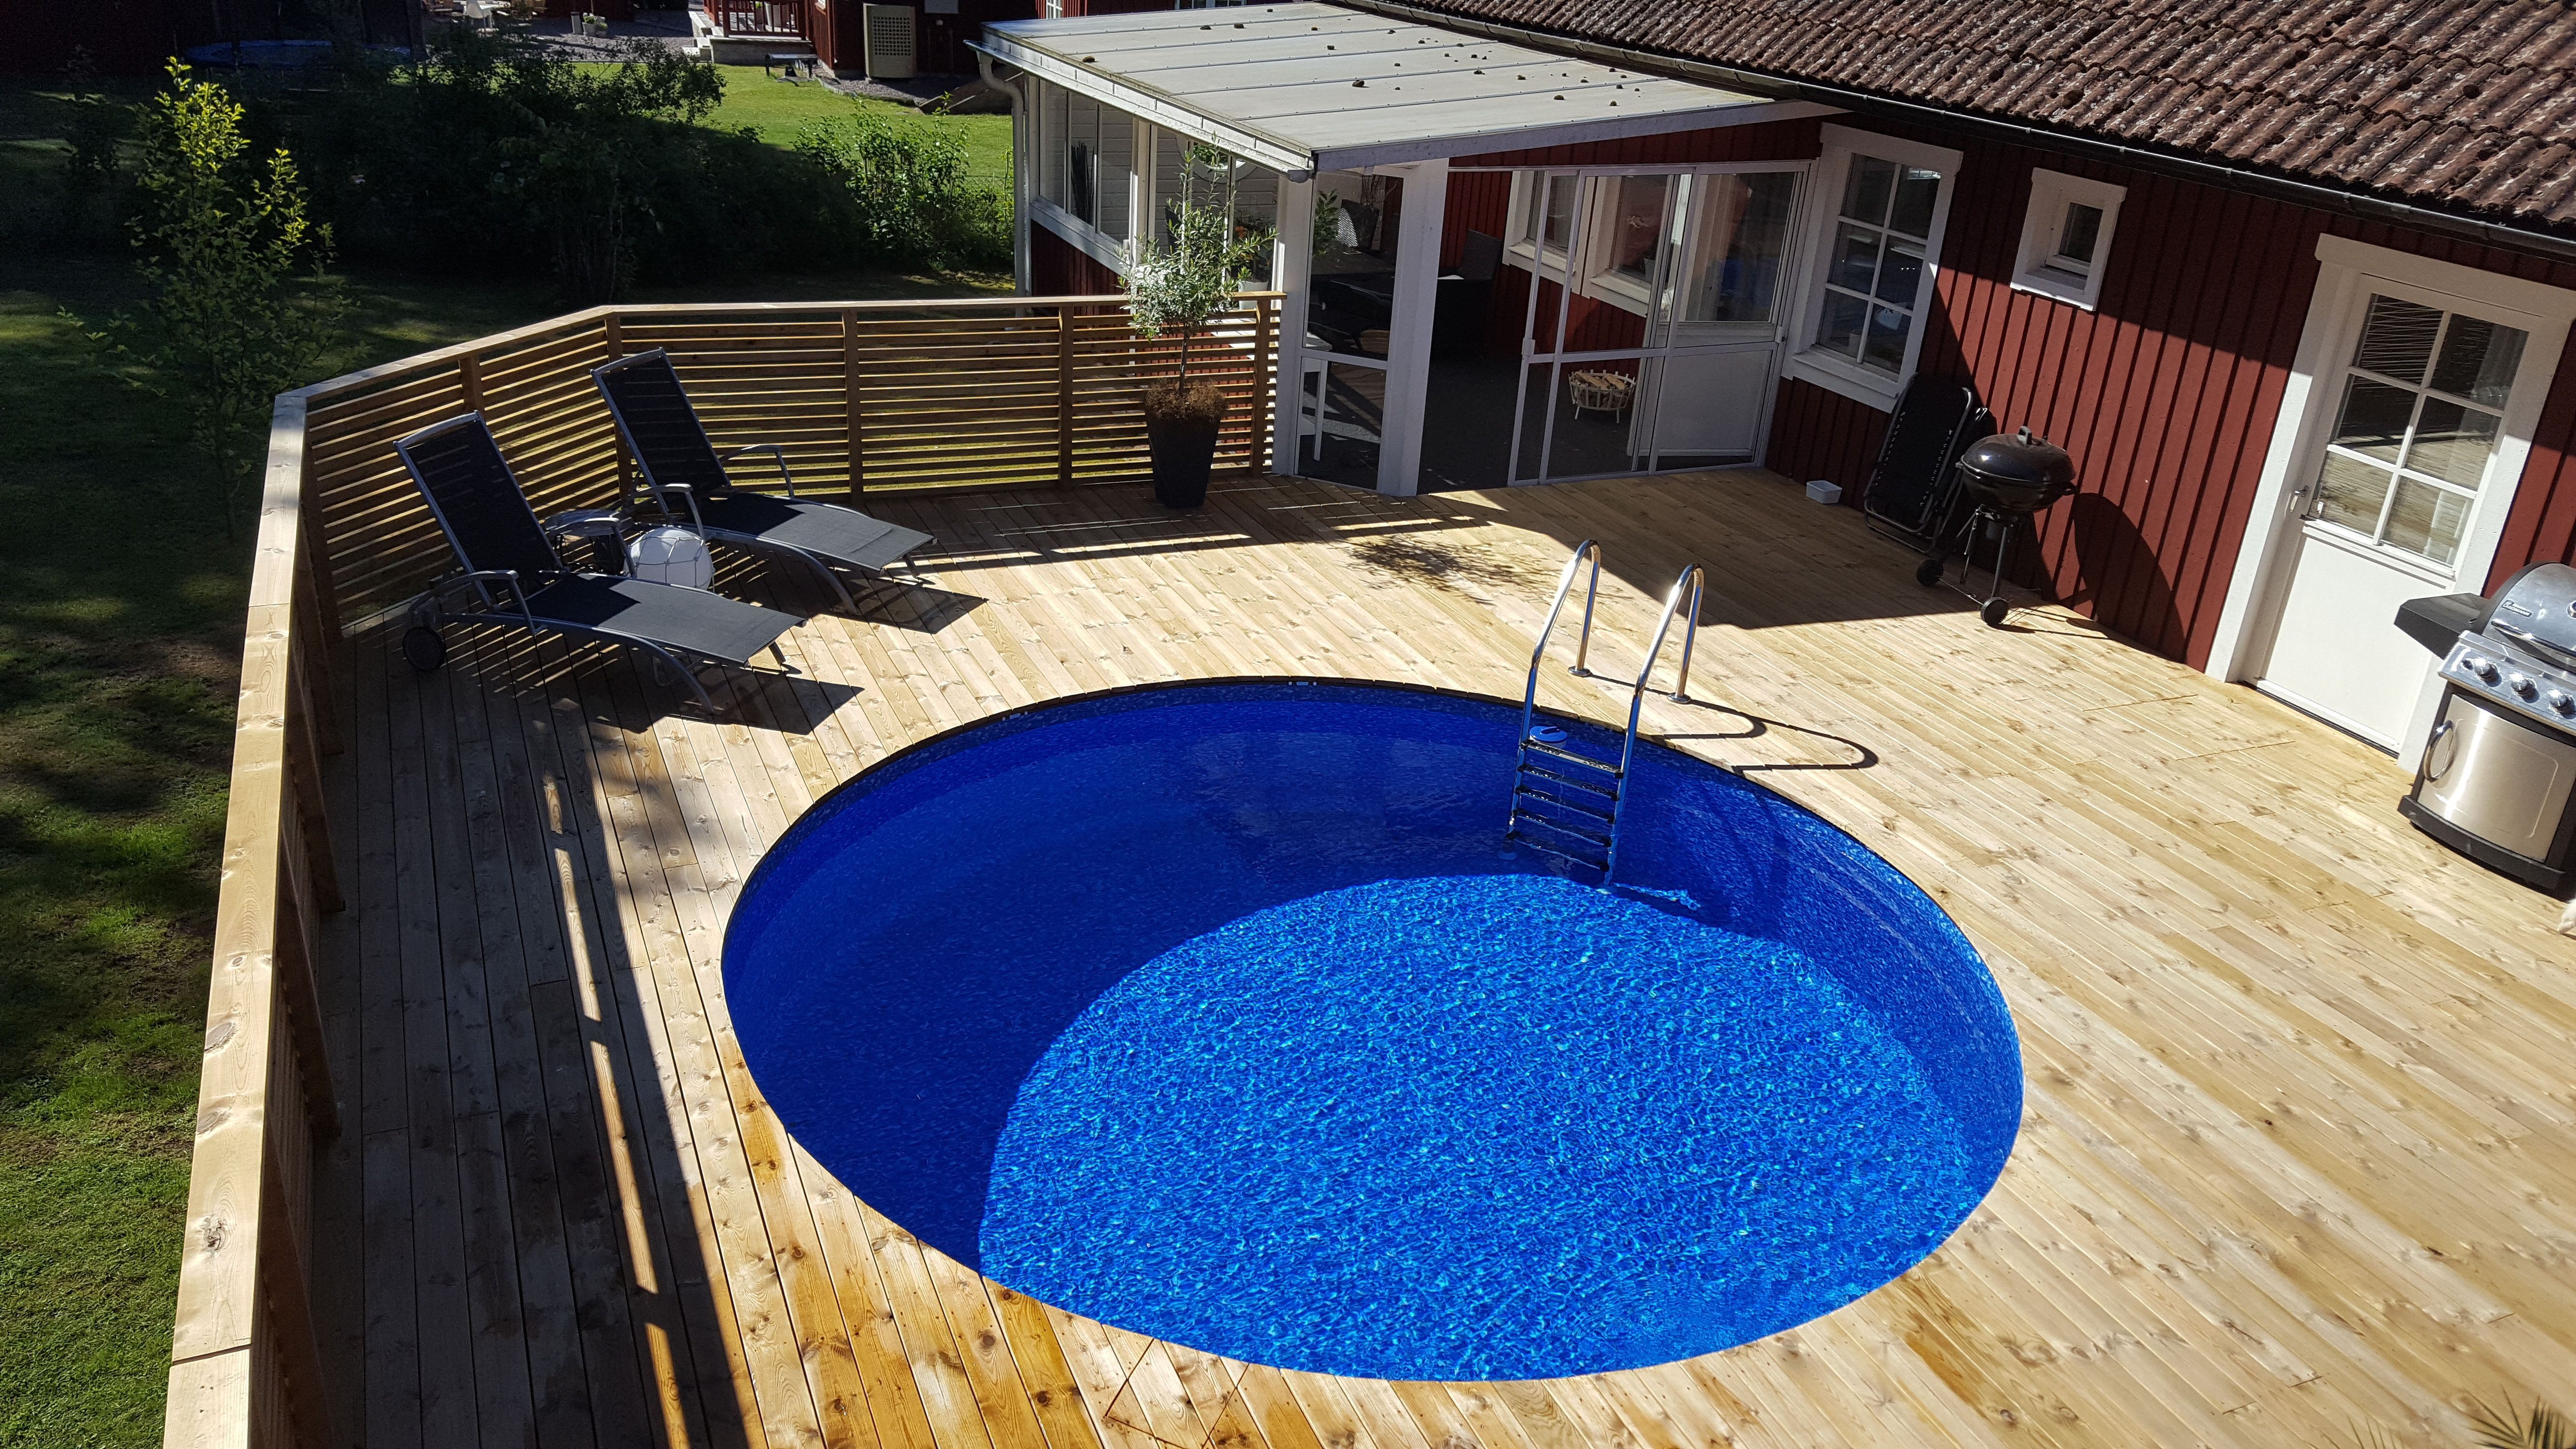 Ovanmarkspool Rund Pool Nedgrävd Från Primastar Poolbygge 6e5a309b27093